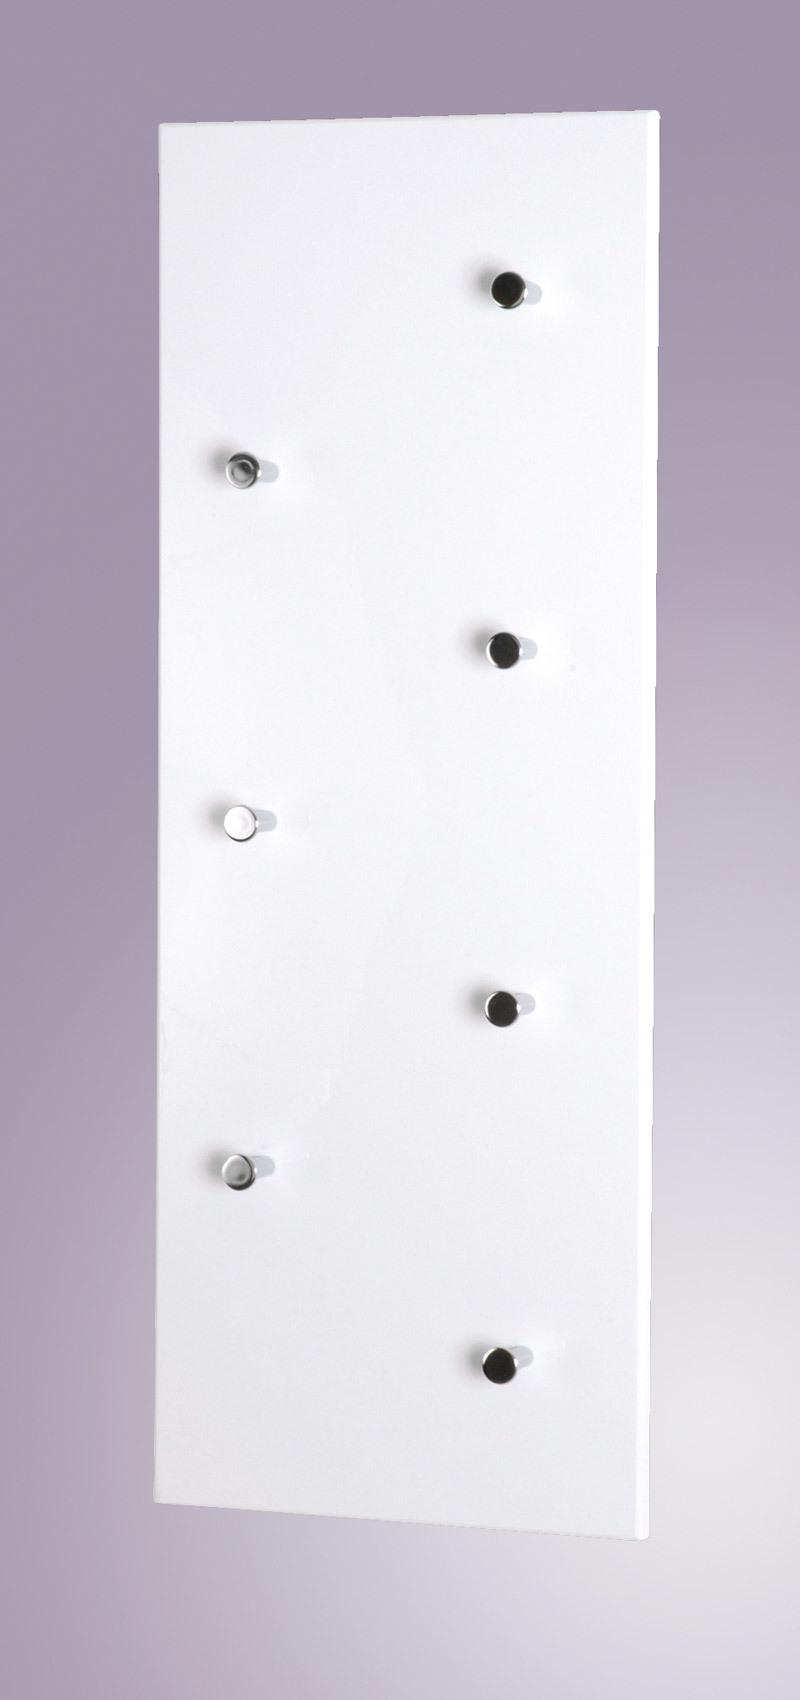 porte manteau mural design blanc wall miliboo. Black Bedroom Furniture Sets. Home Design Ideas